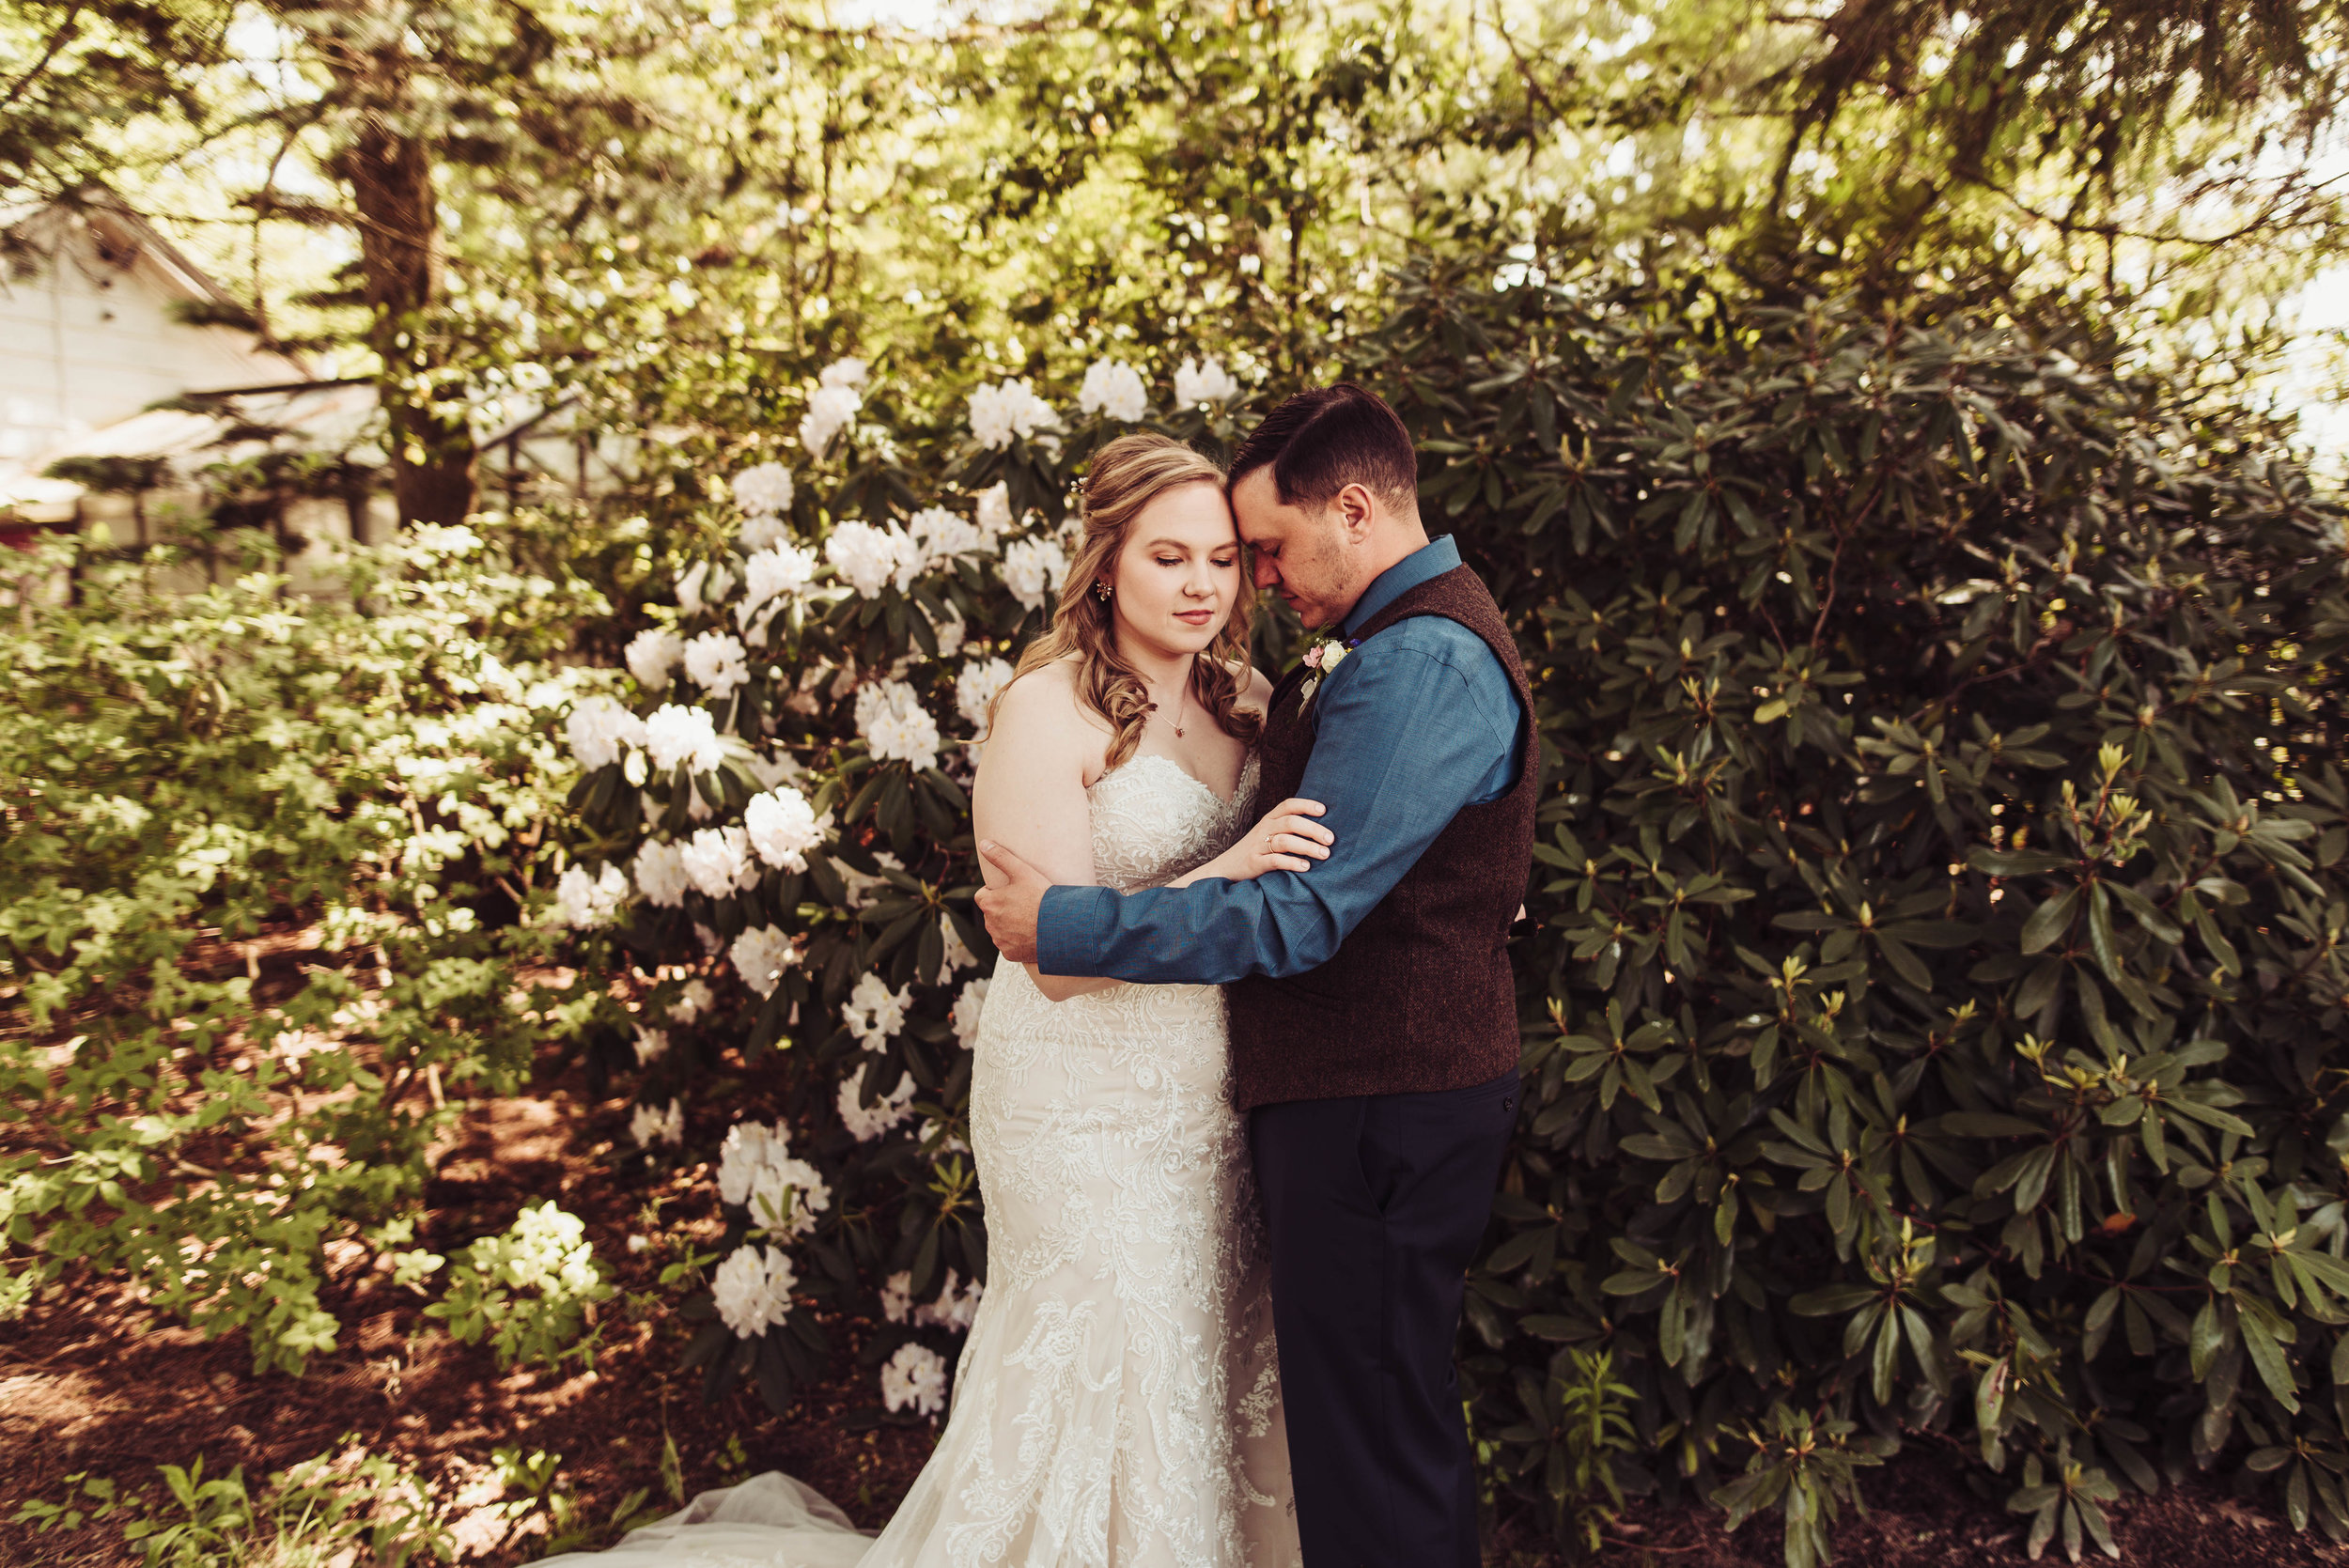 succop wedding photos-25.jpg